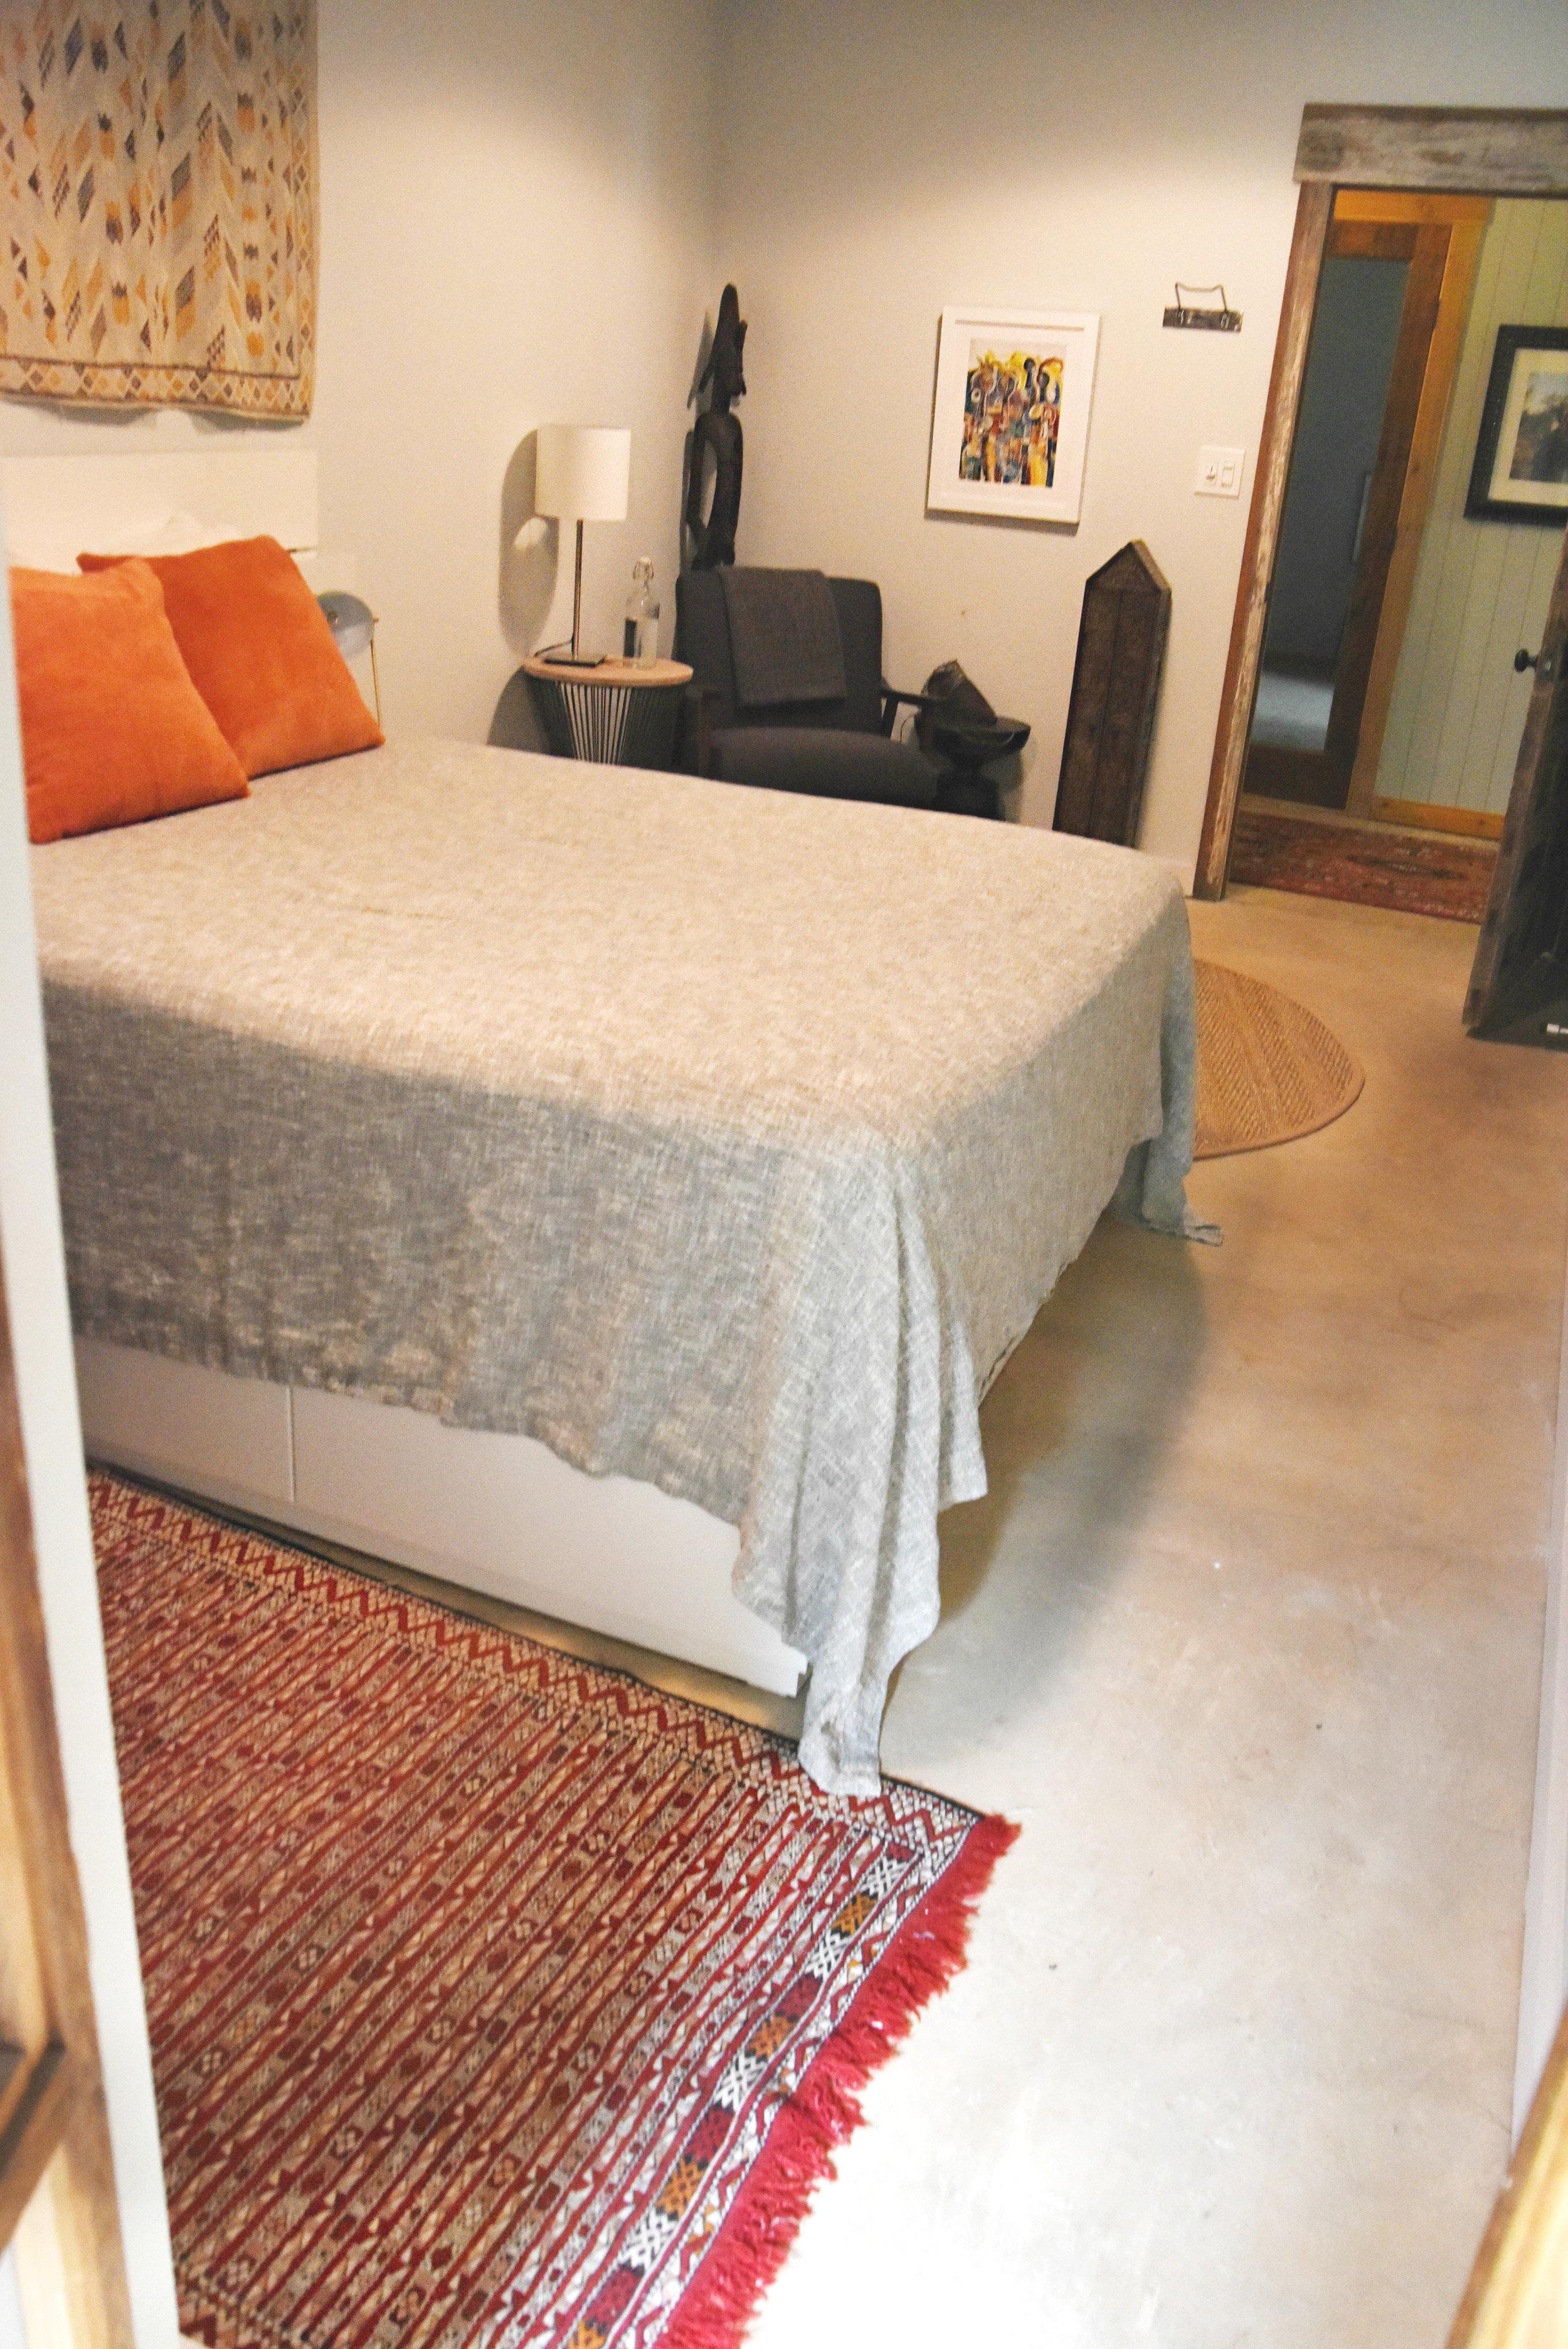 The Damasco Room